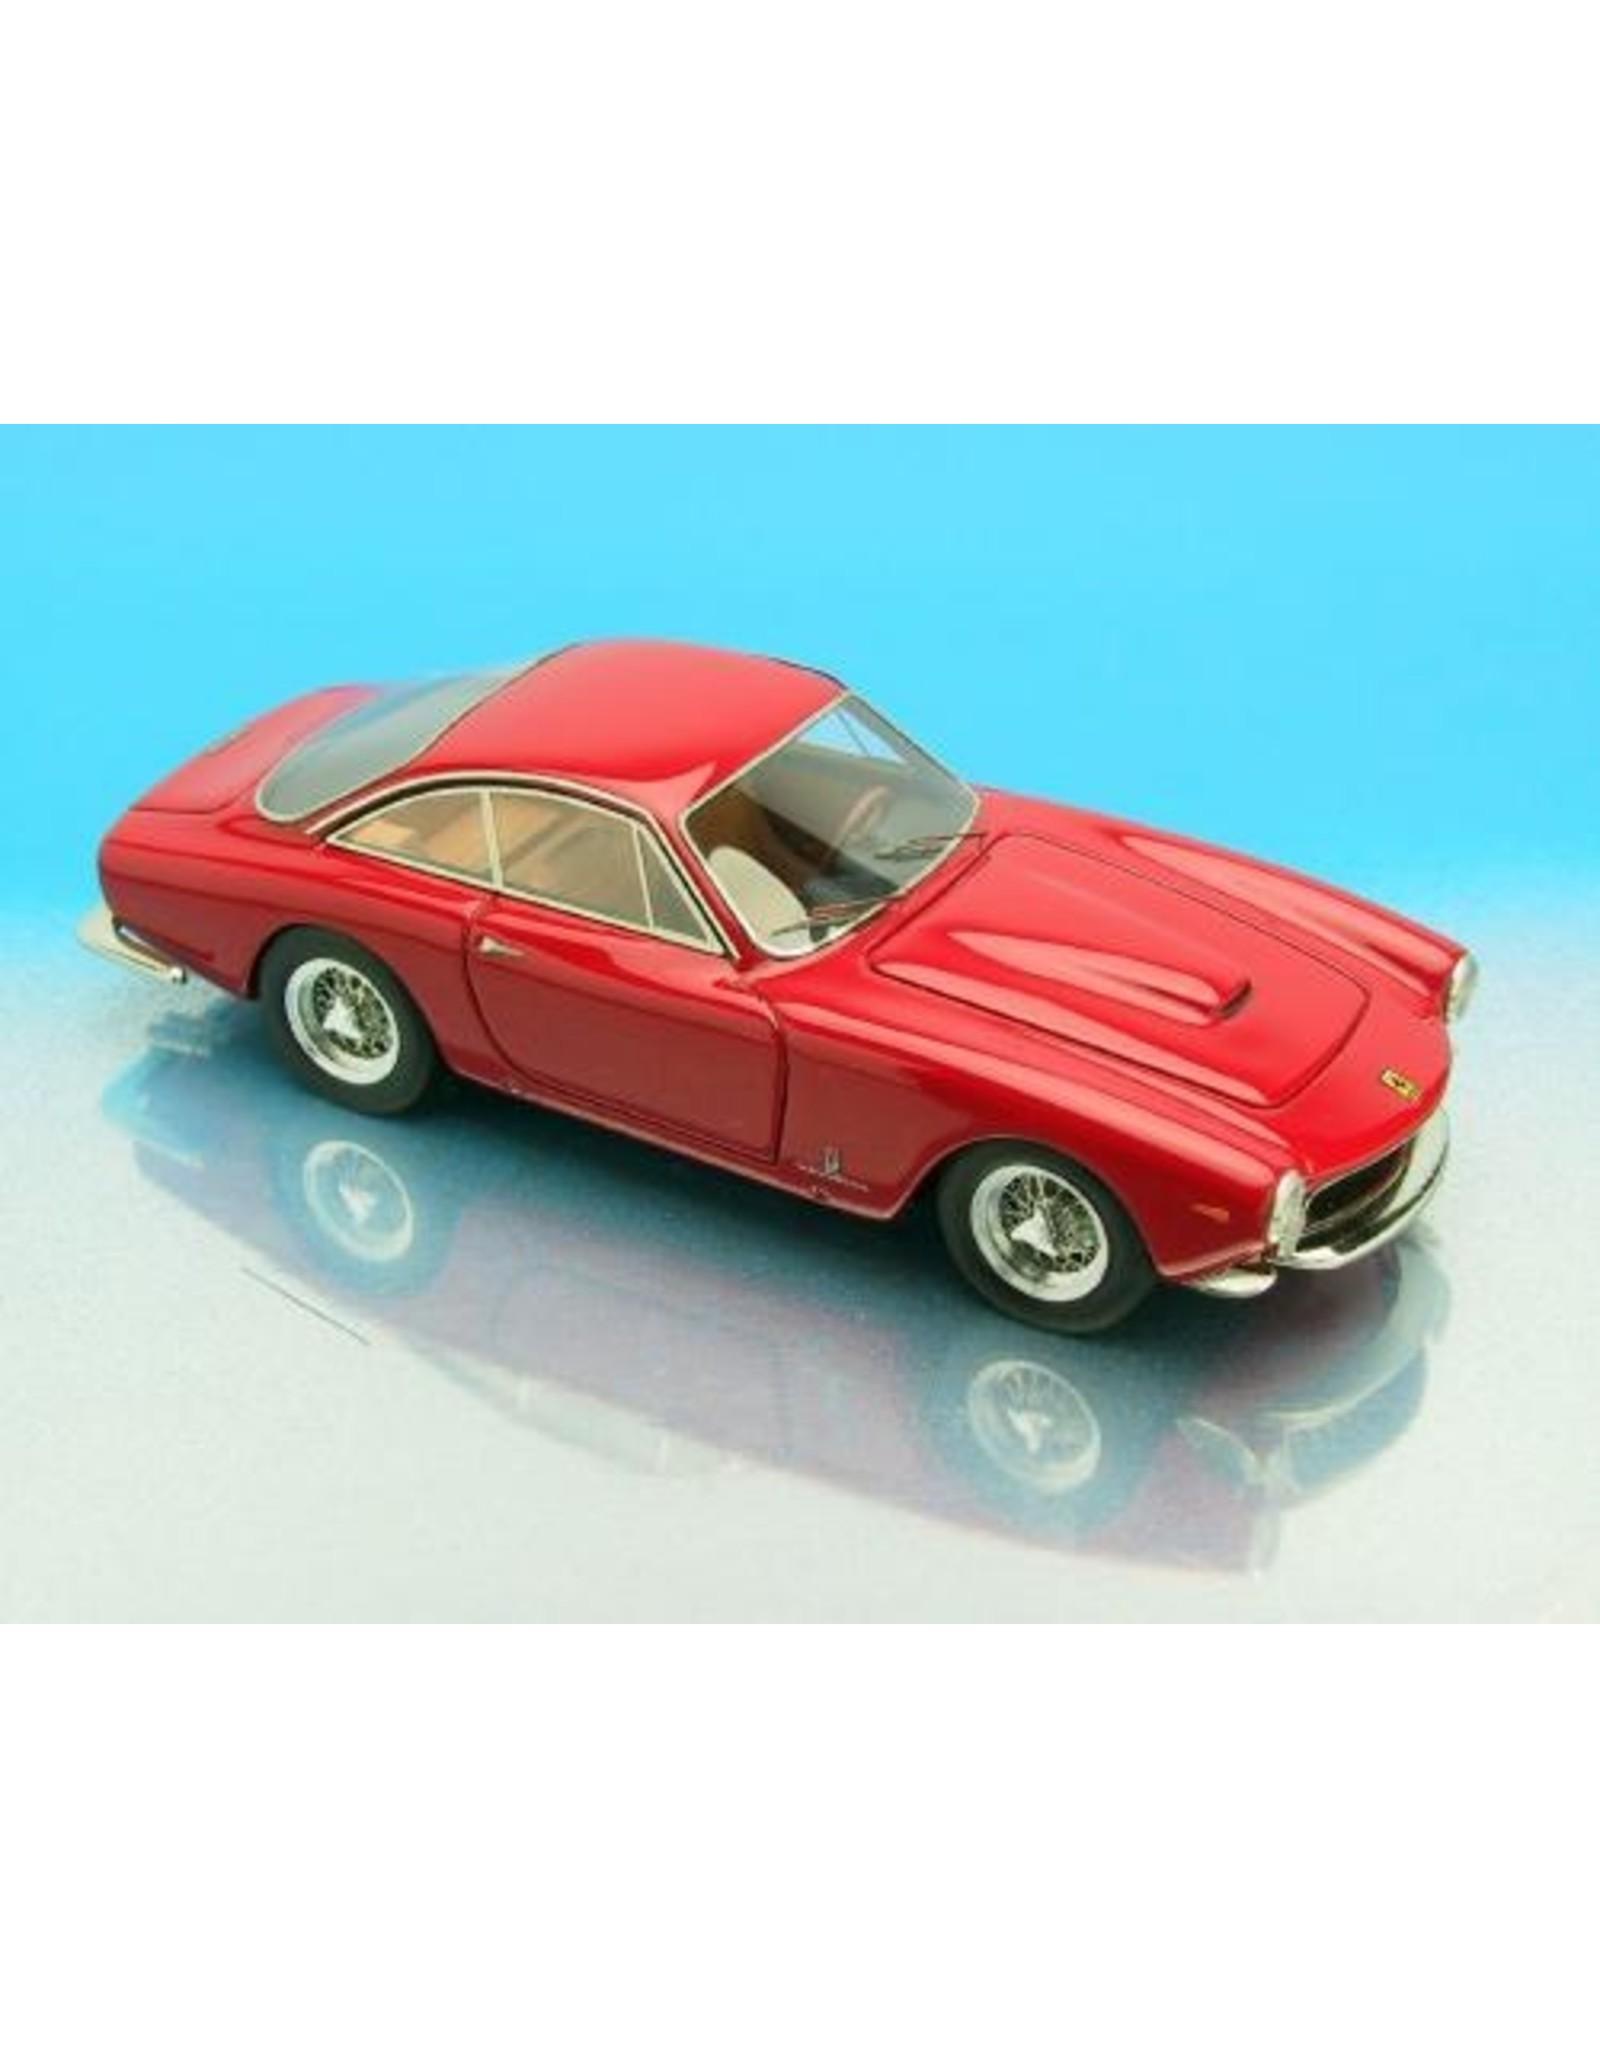 Ferrari Ferrari 250 Lusso Coupe 1963 - 1:43 - BBR